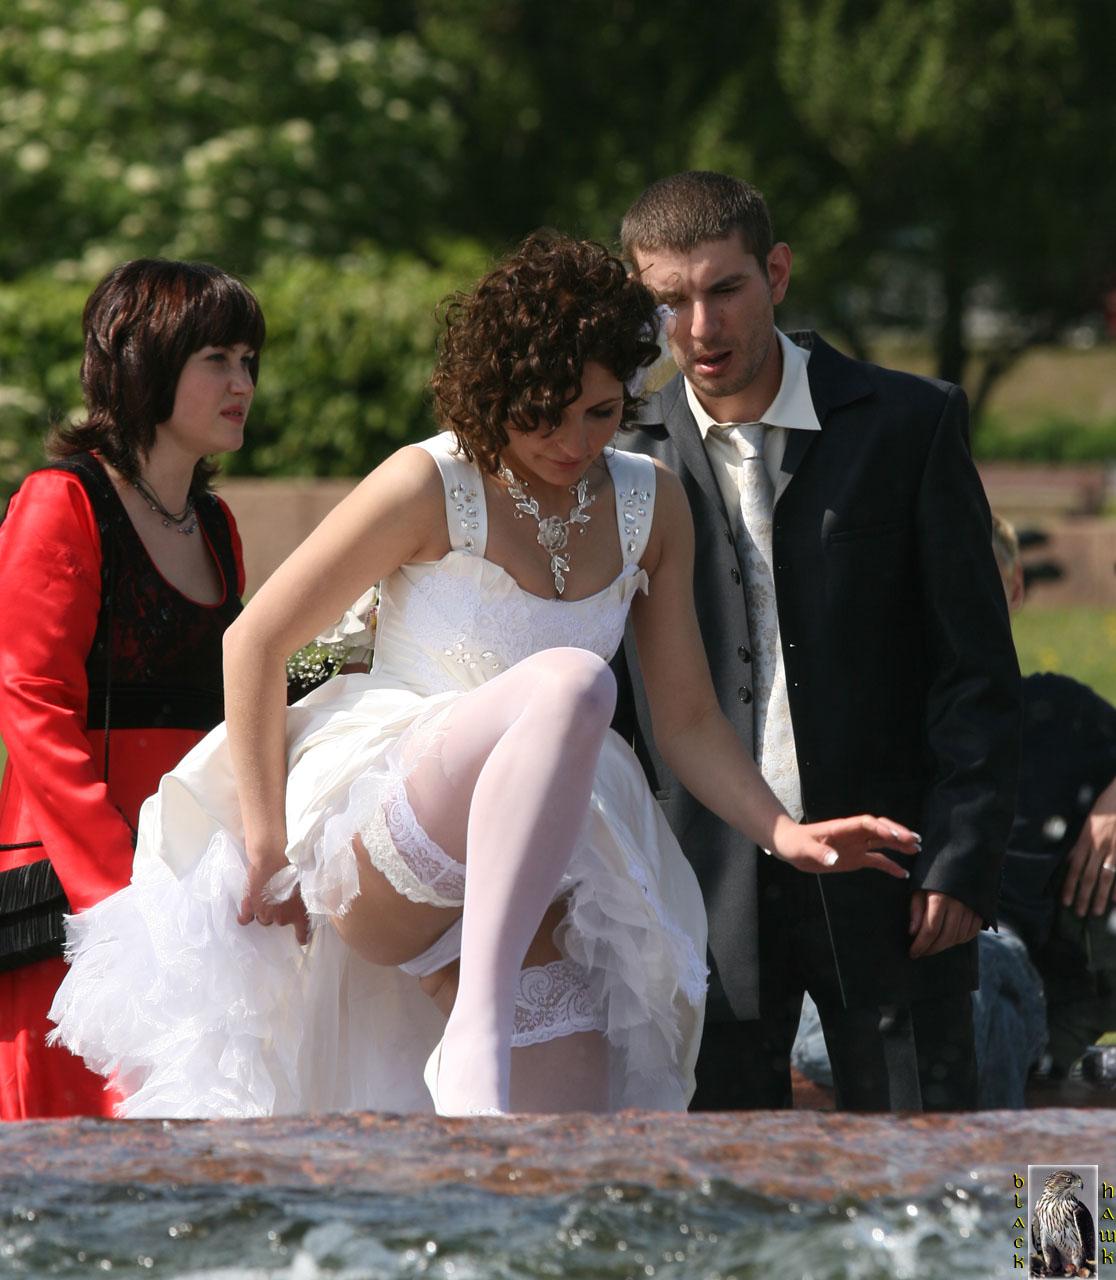 Bridal upskirt